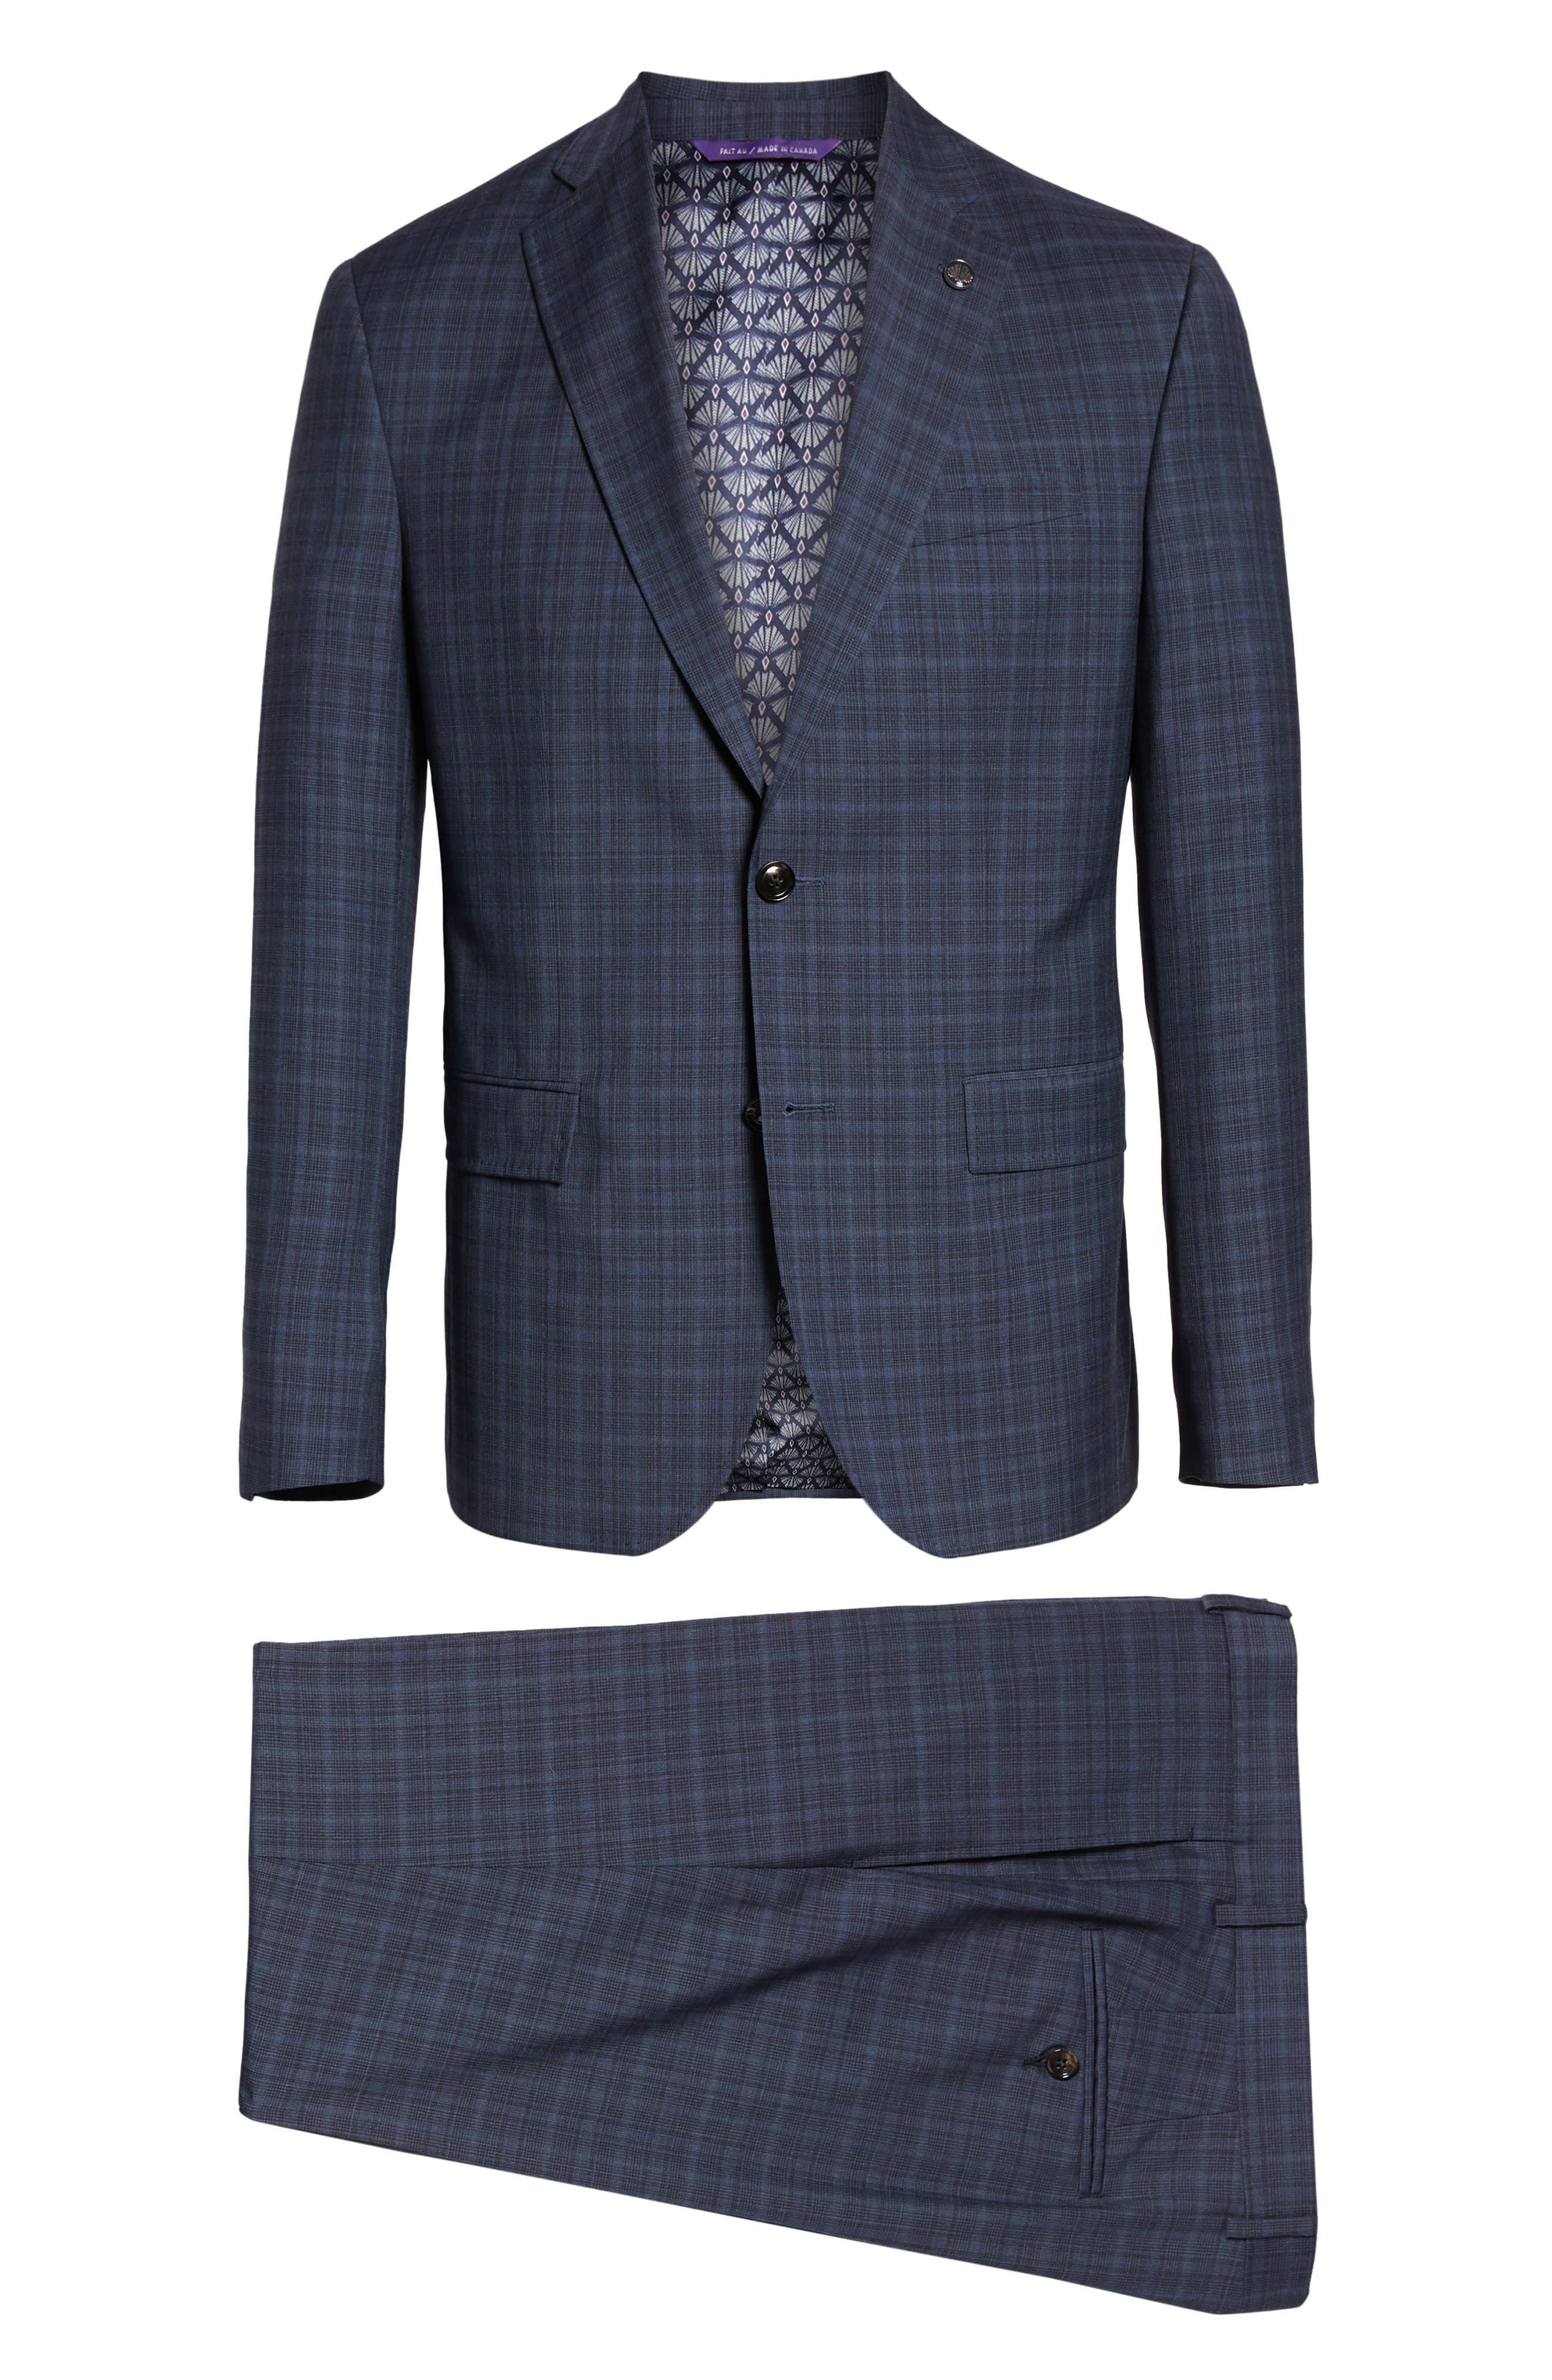 TED BAKER LONDON,                             Roger Slim Fit Plaid Wool Suit,                             Alternate thumbnail 8, color,                             GREY